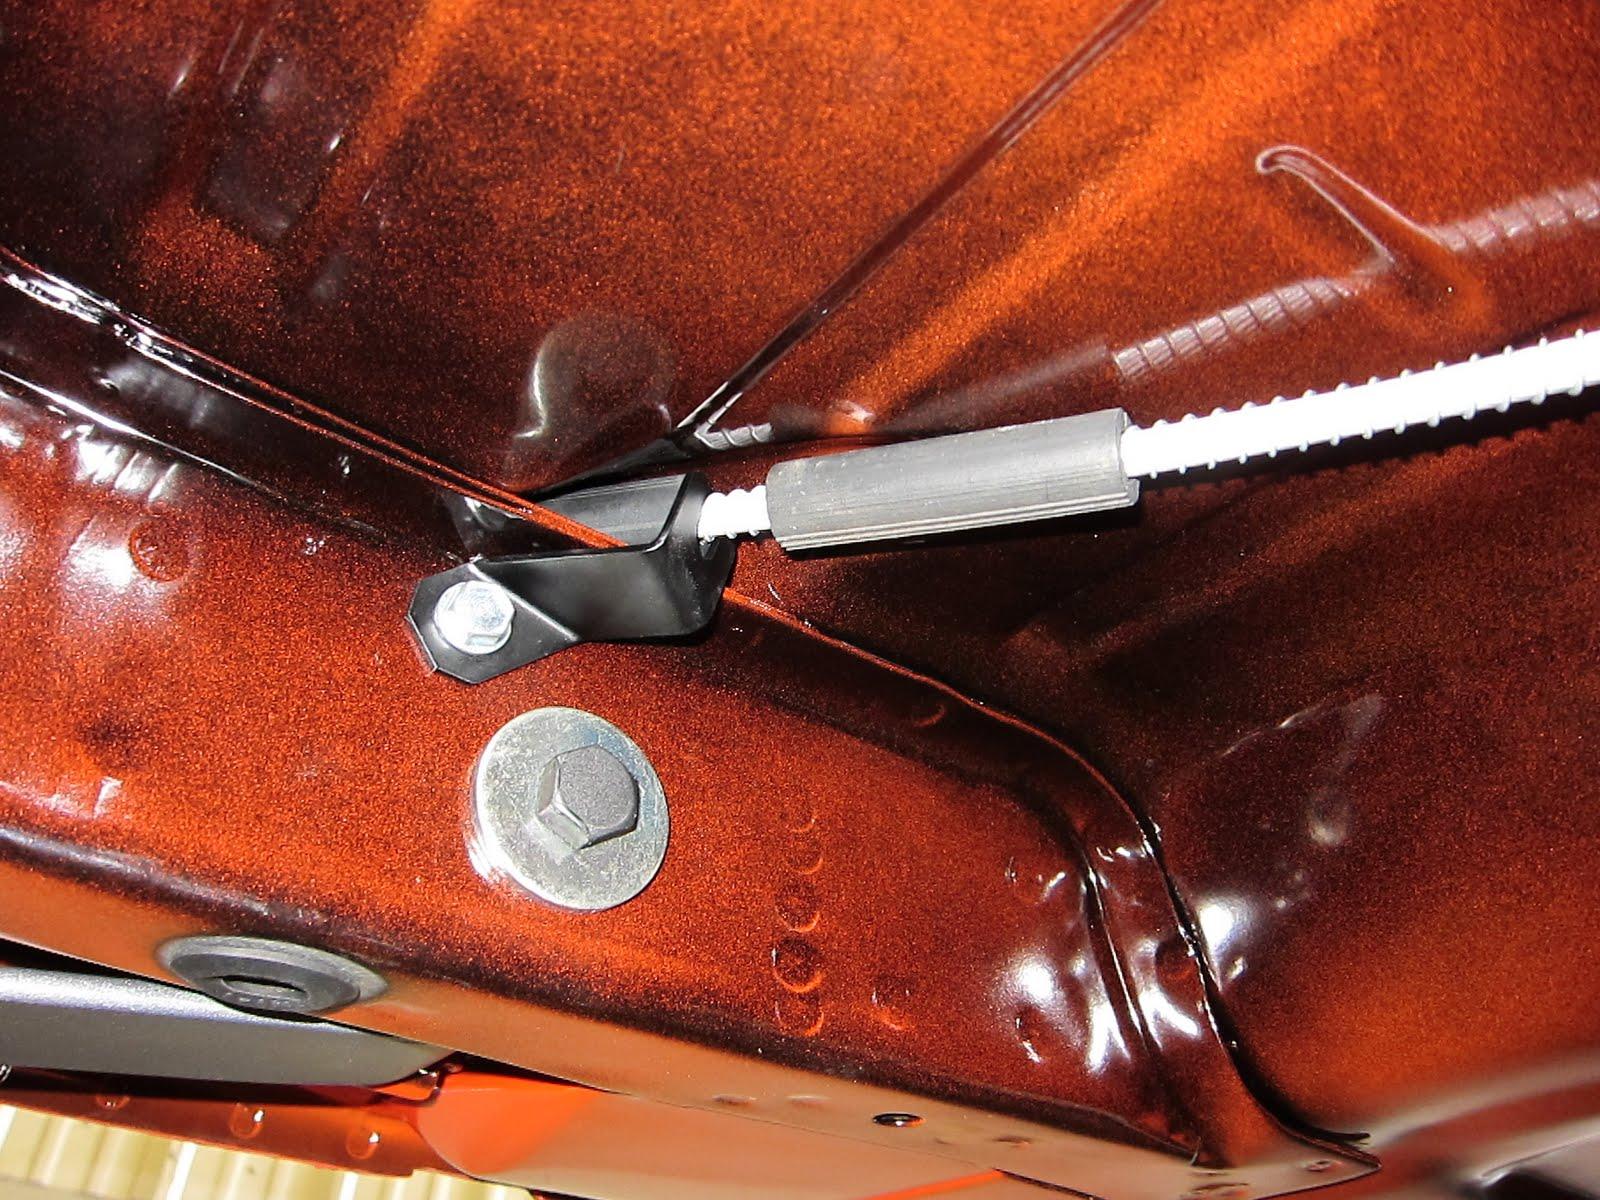 1968 corvette neutral safety wiring diagram corvette